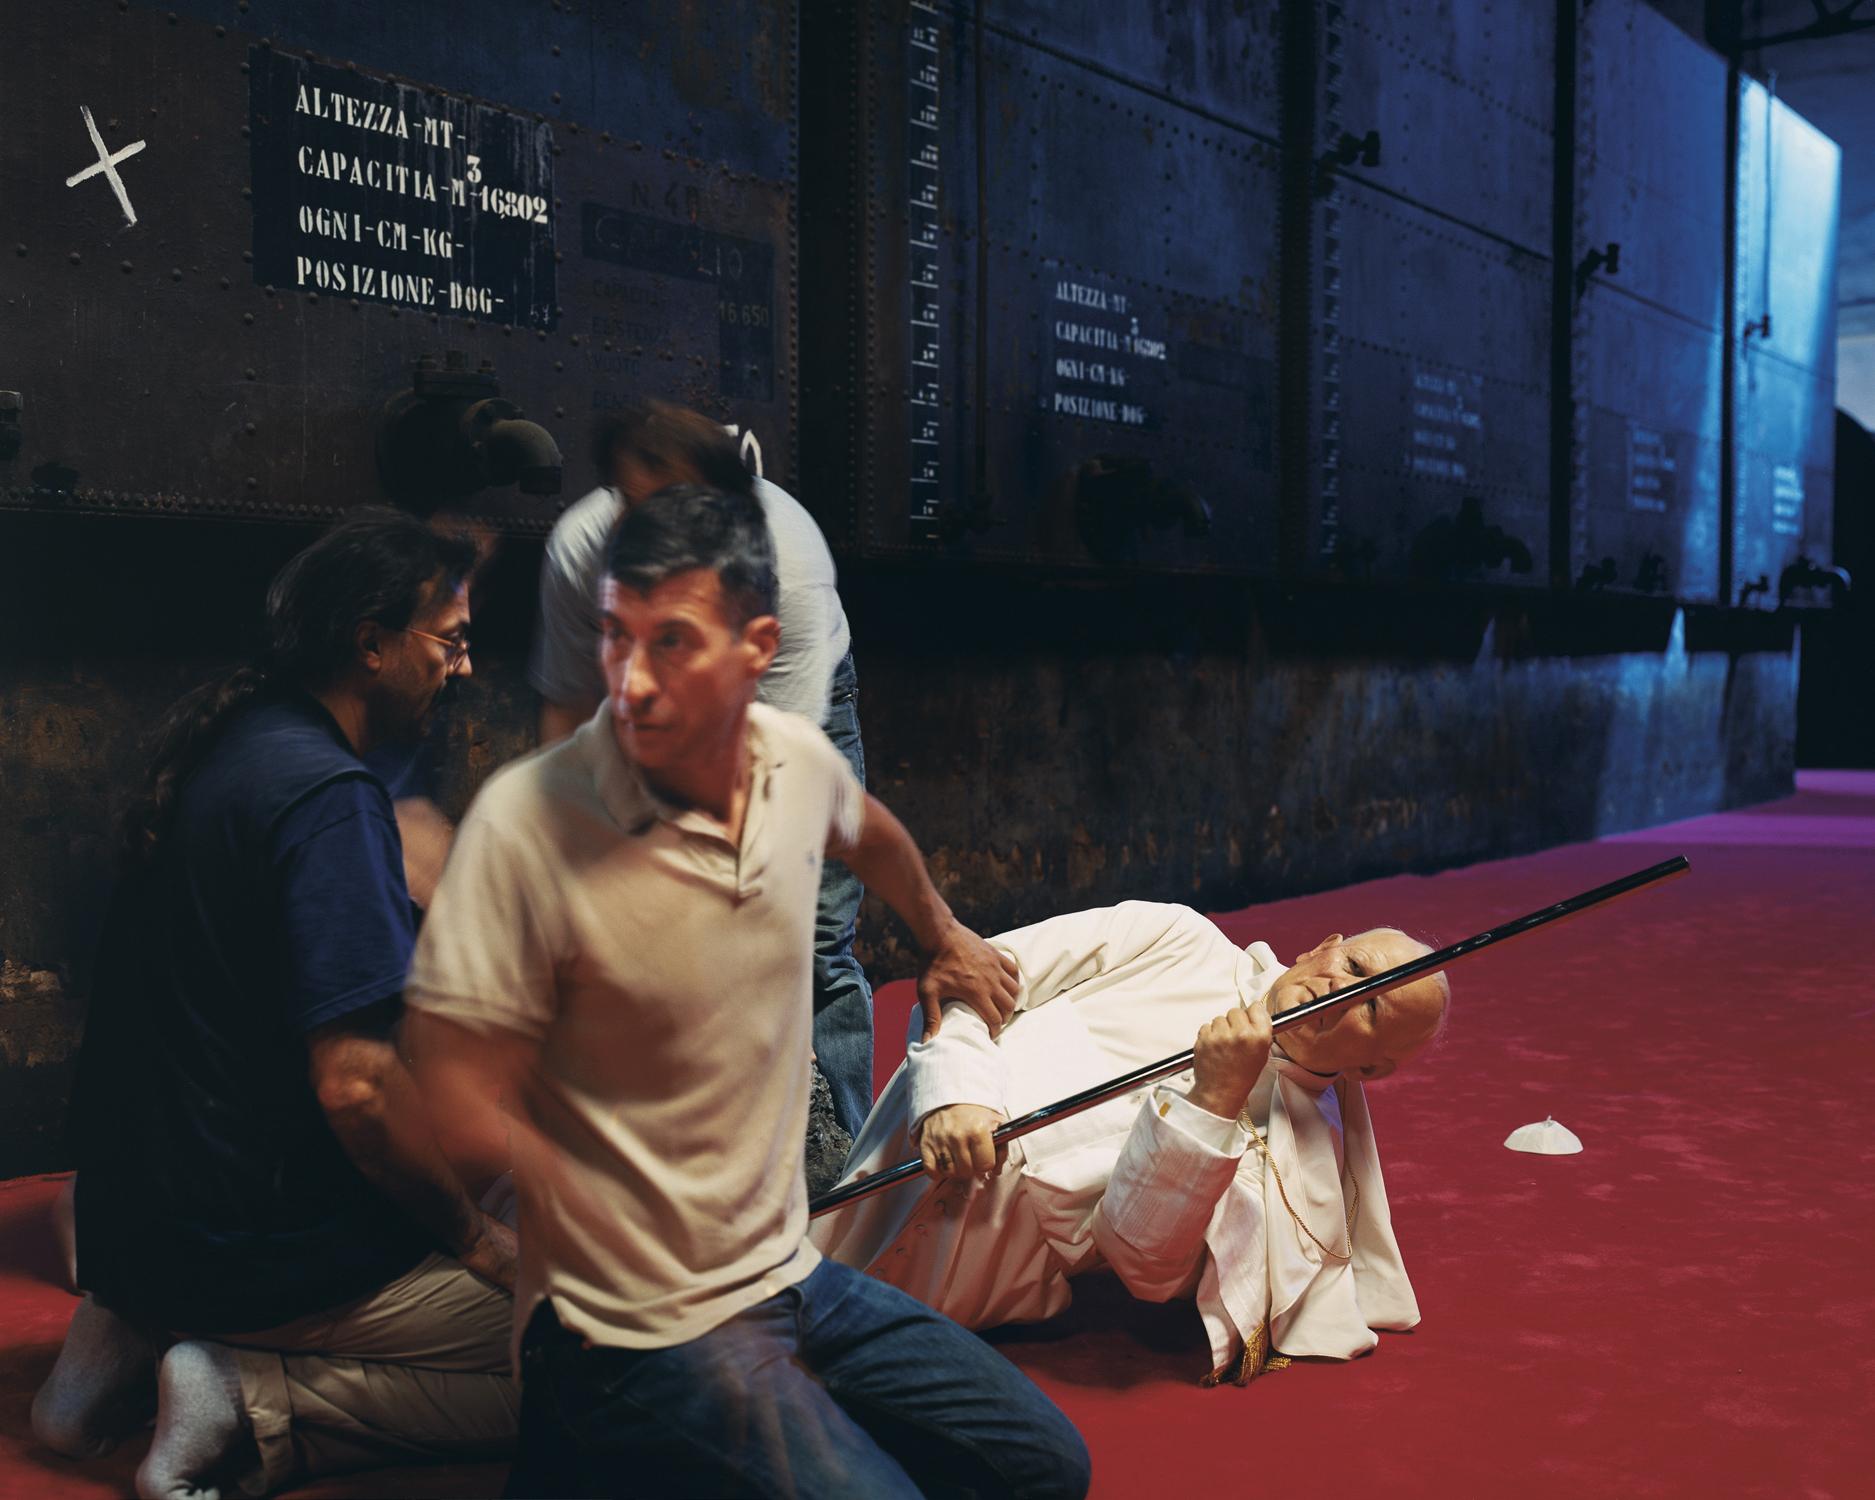 Maurizio Cattelan, 2001 Venice, Italy